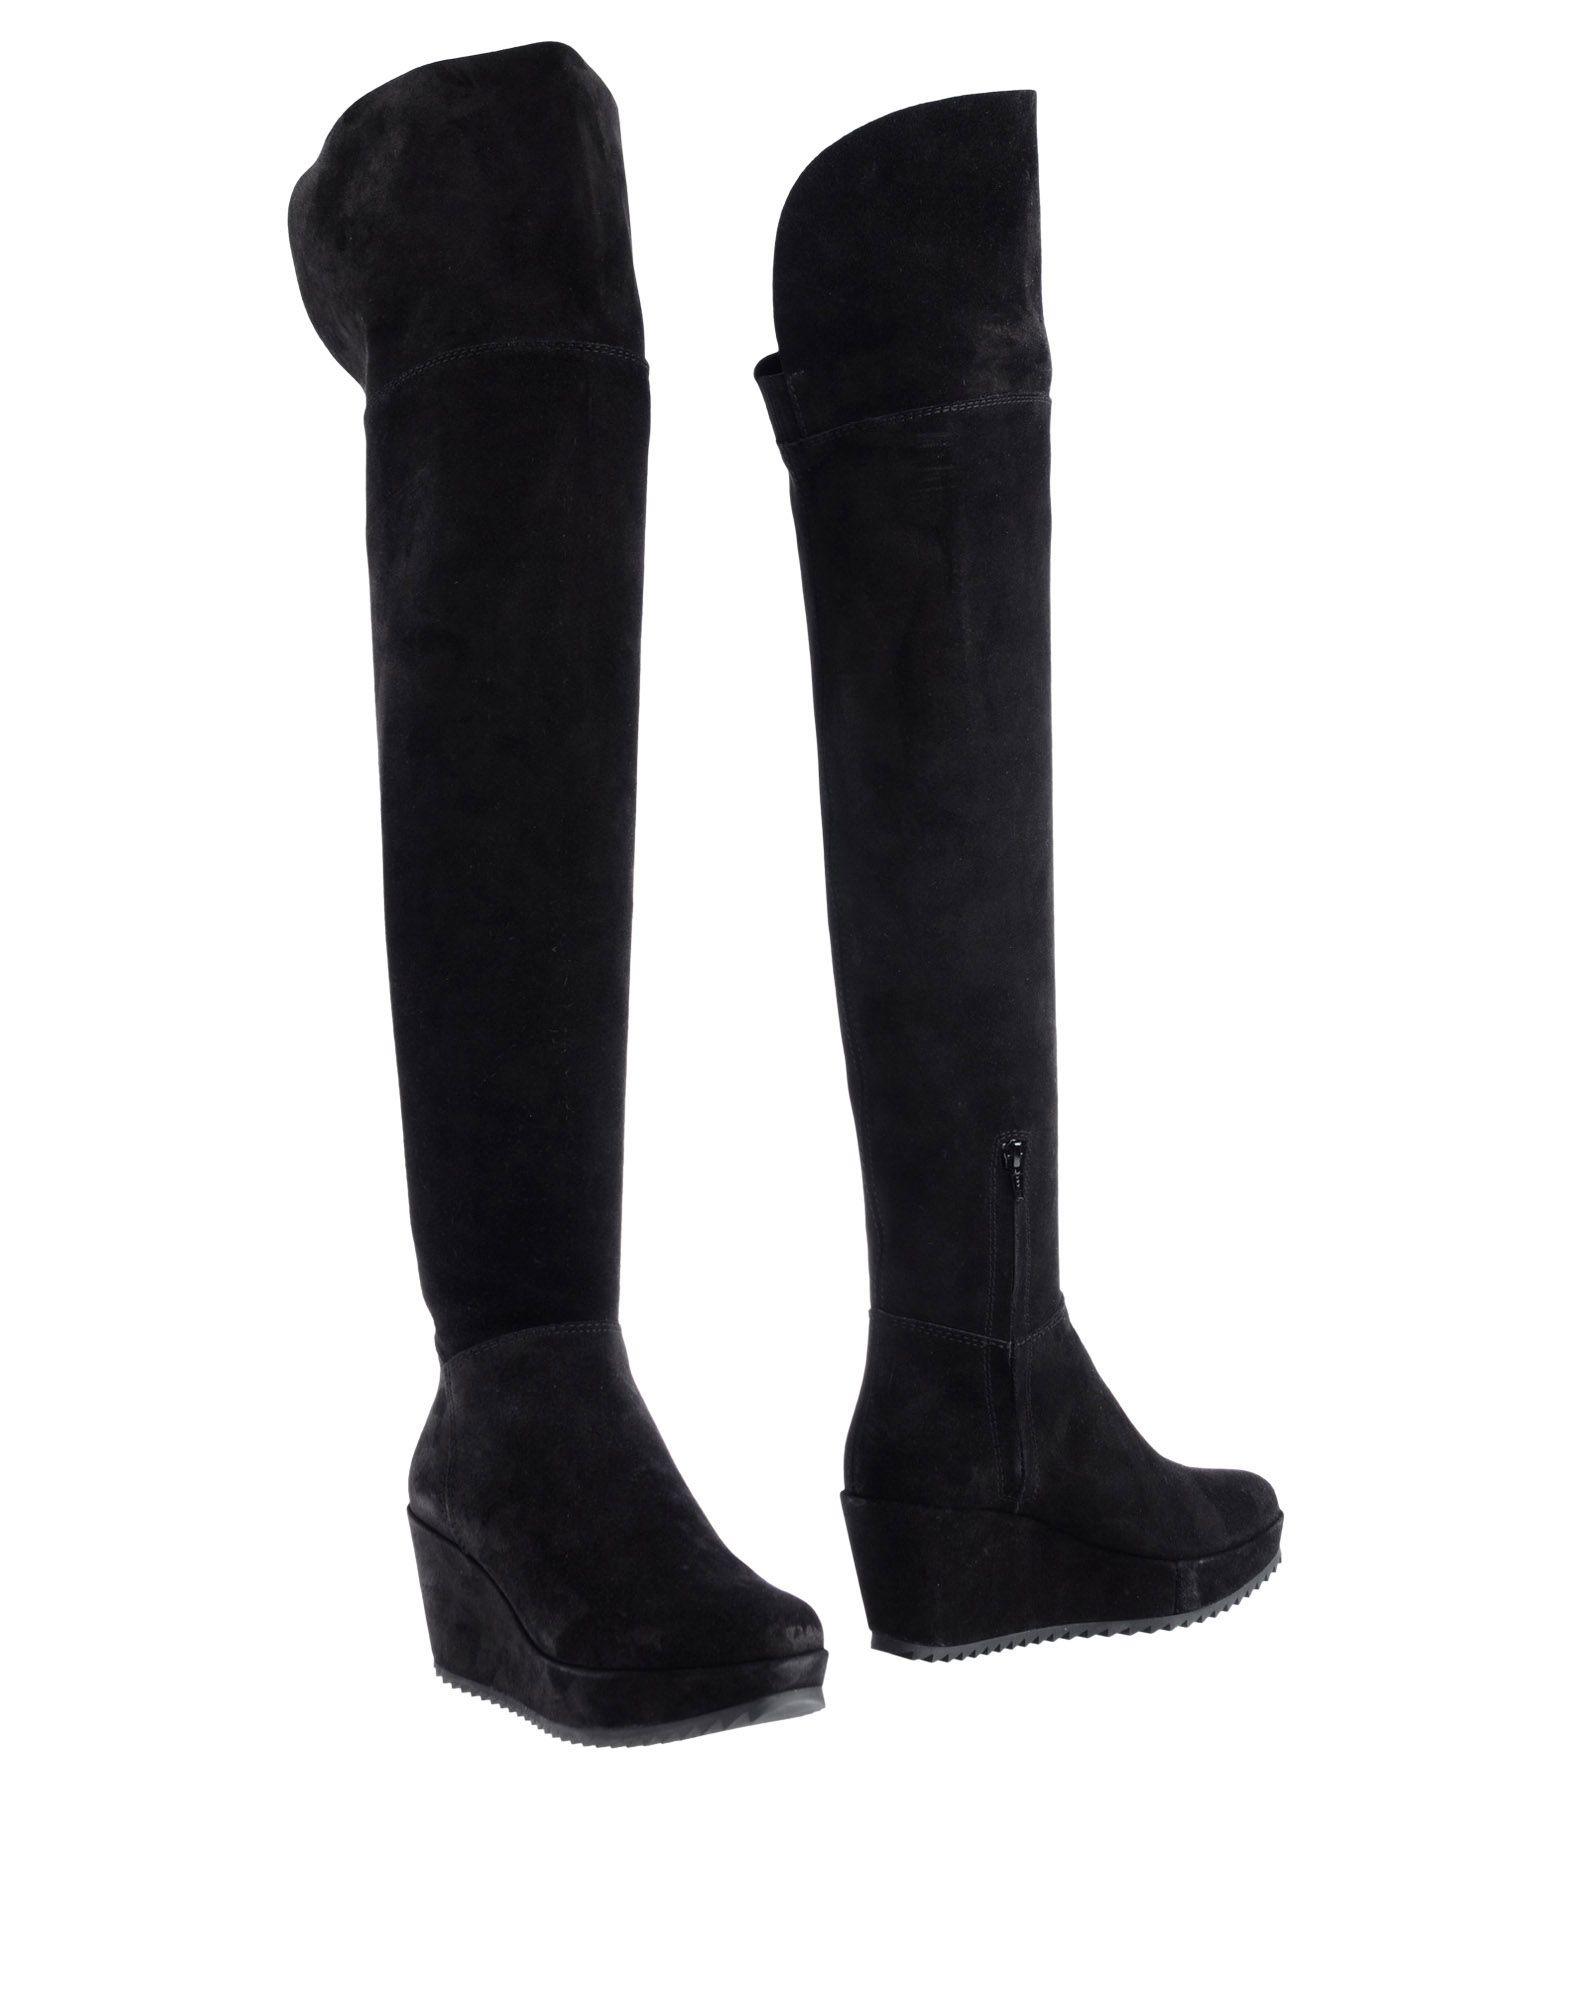 Pedro García Boots - Women on Pedro García Boots online on Women  Australia - 11281455ST 7c8815